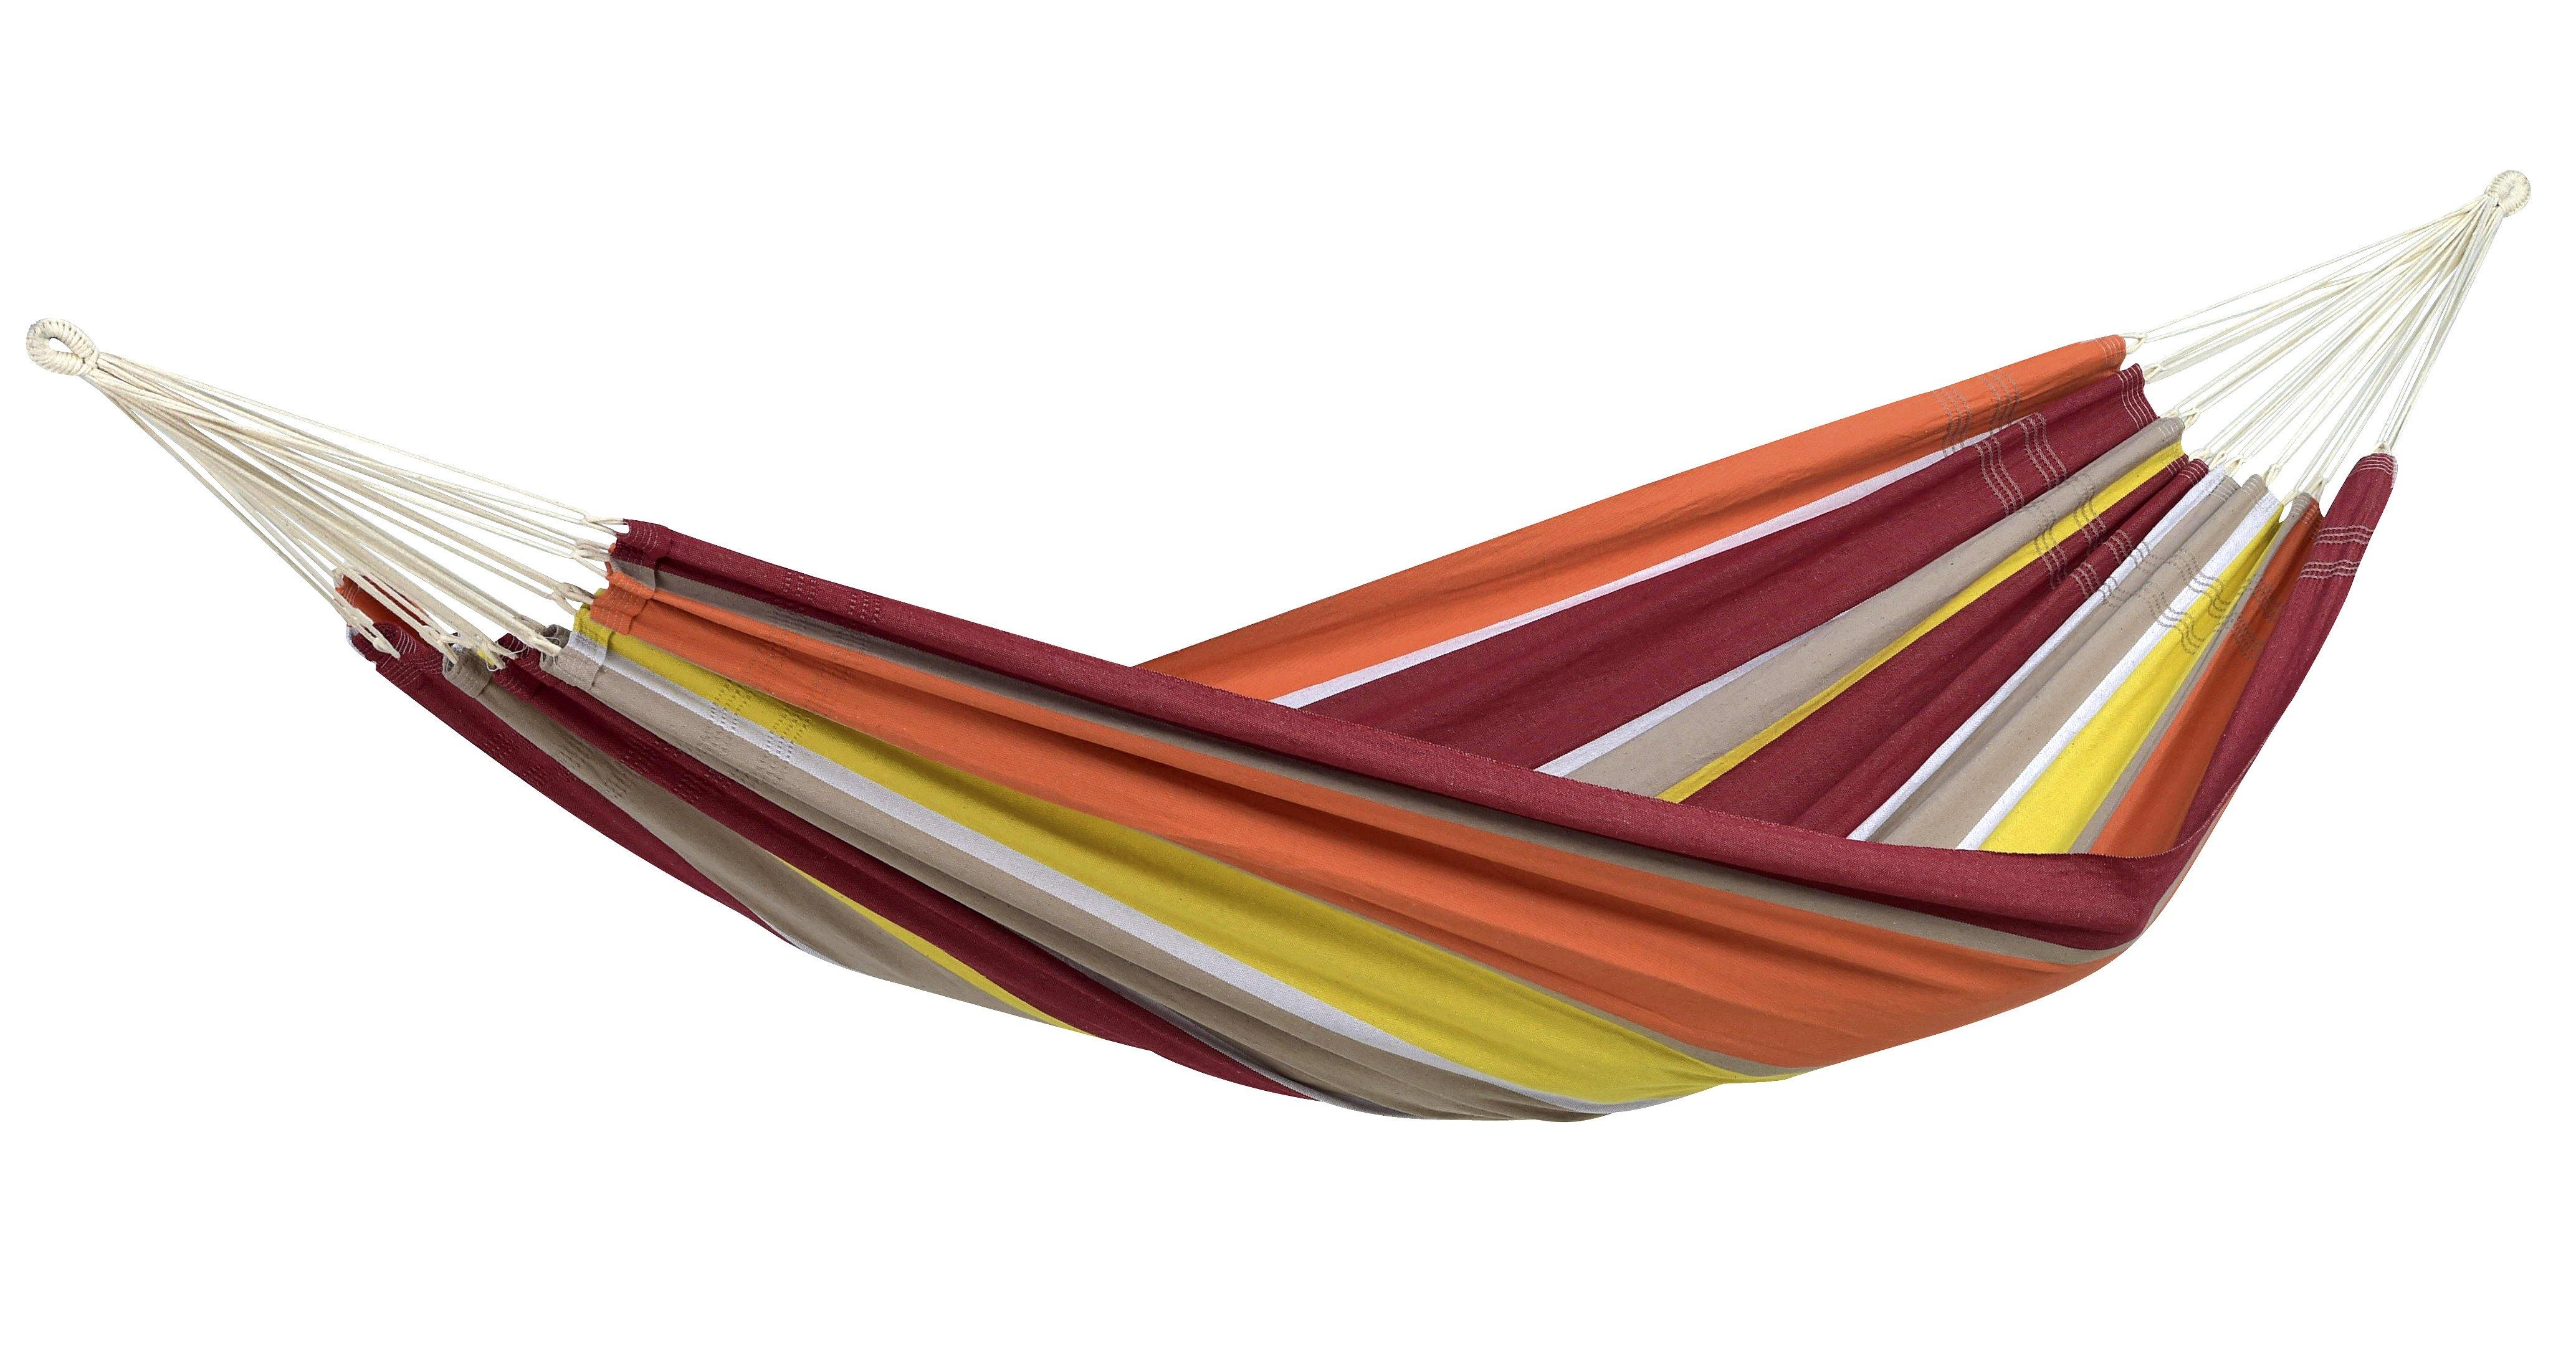 Amazonas Barbados Hængekøje - flere varianter